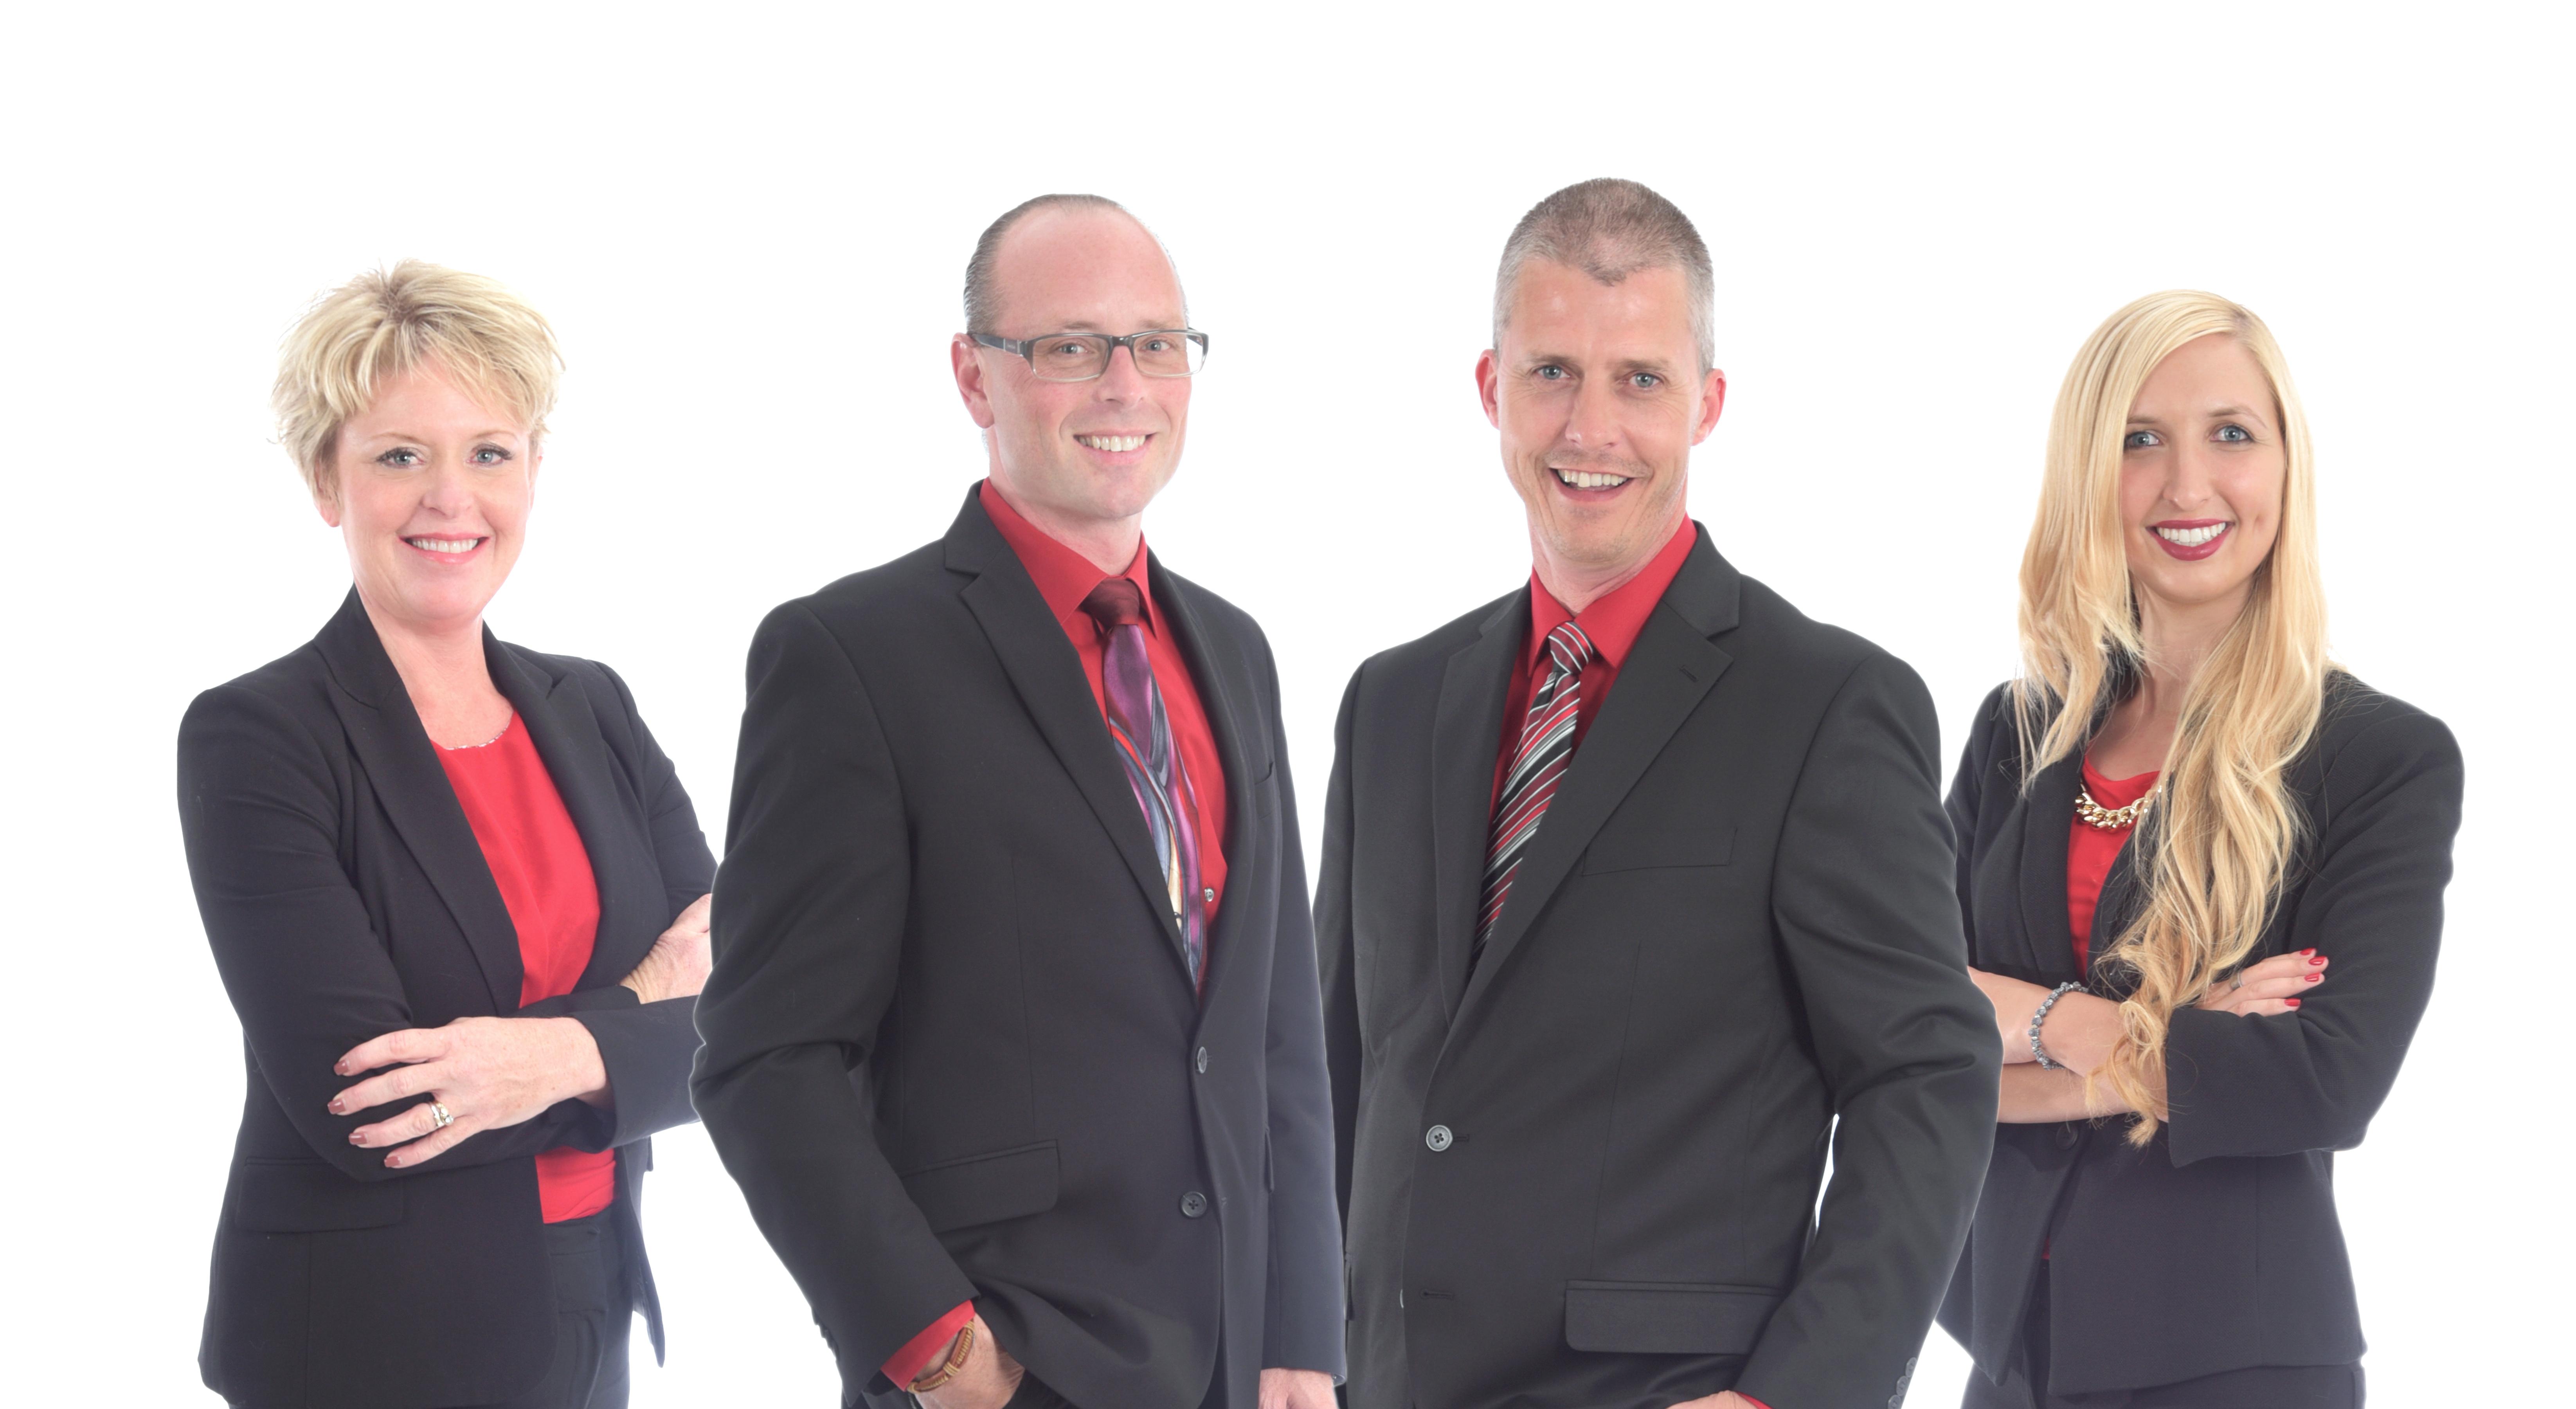 The Troy Sage Team